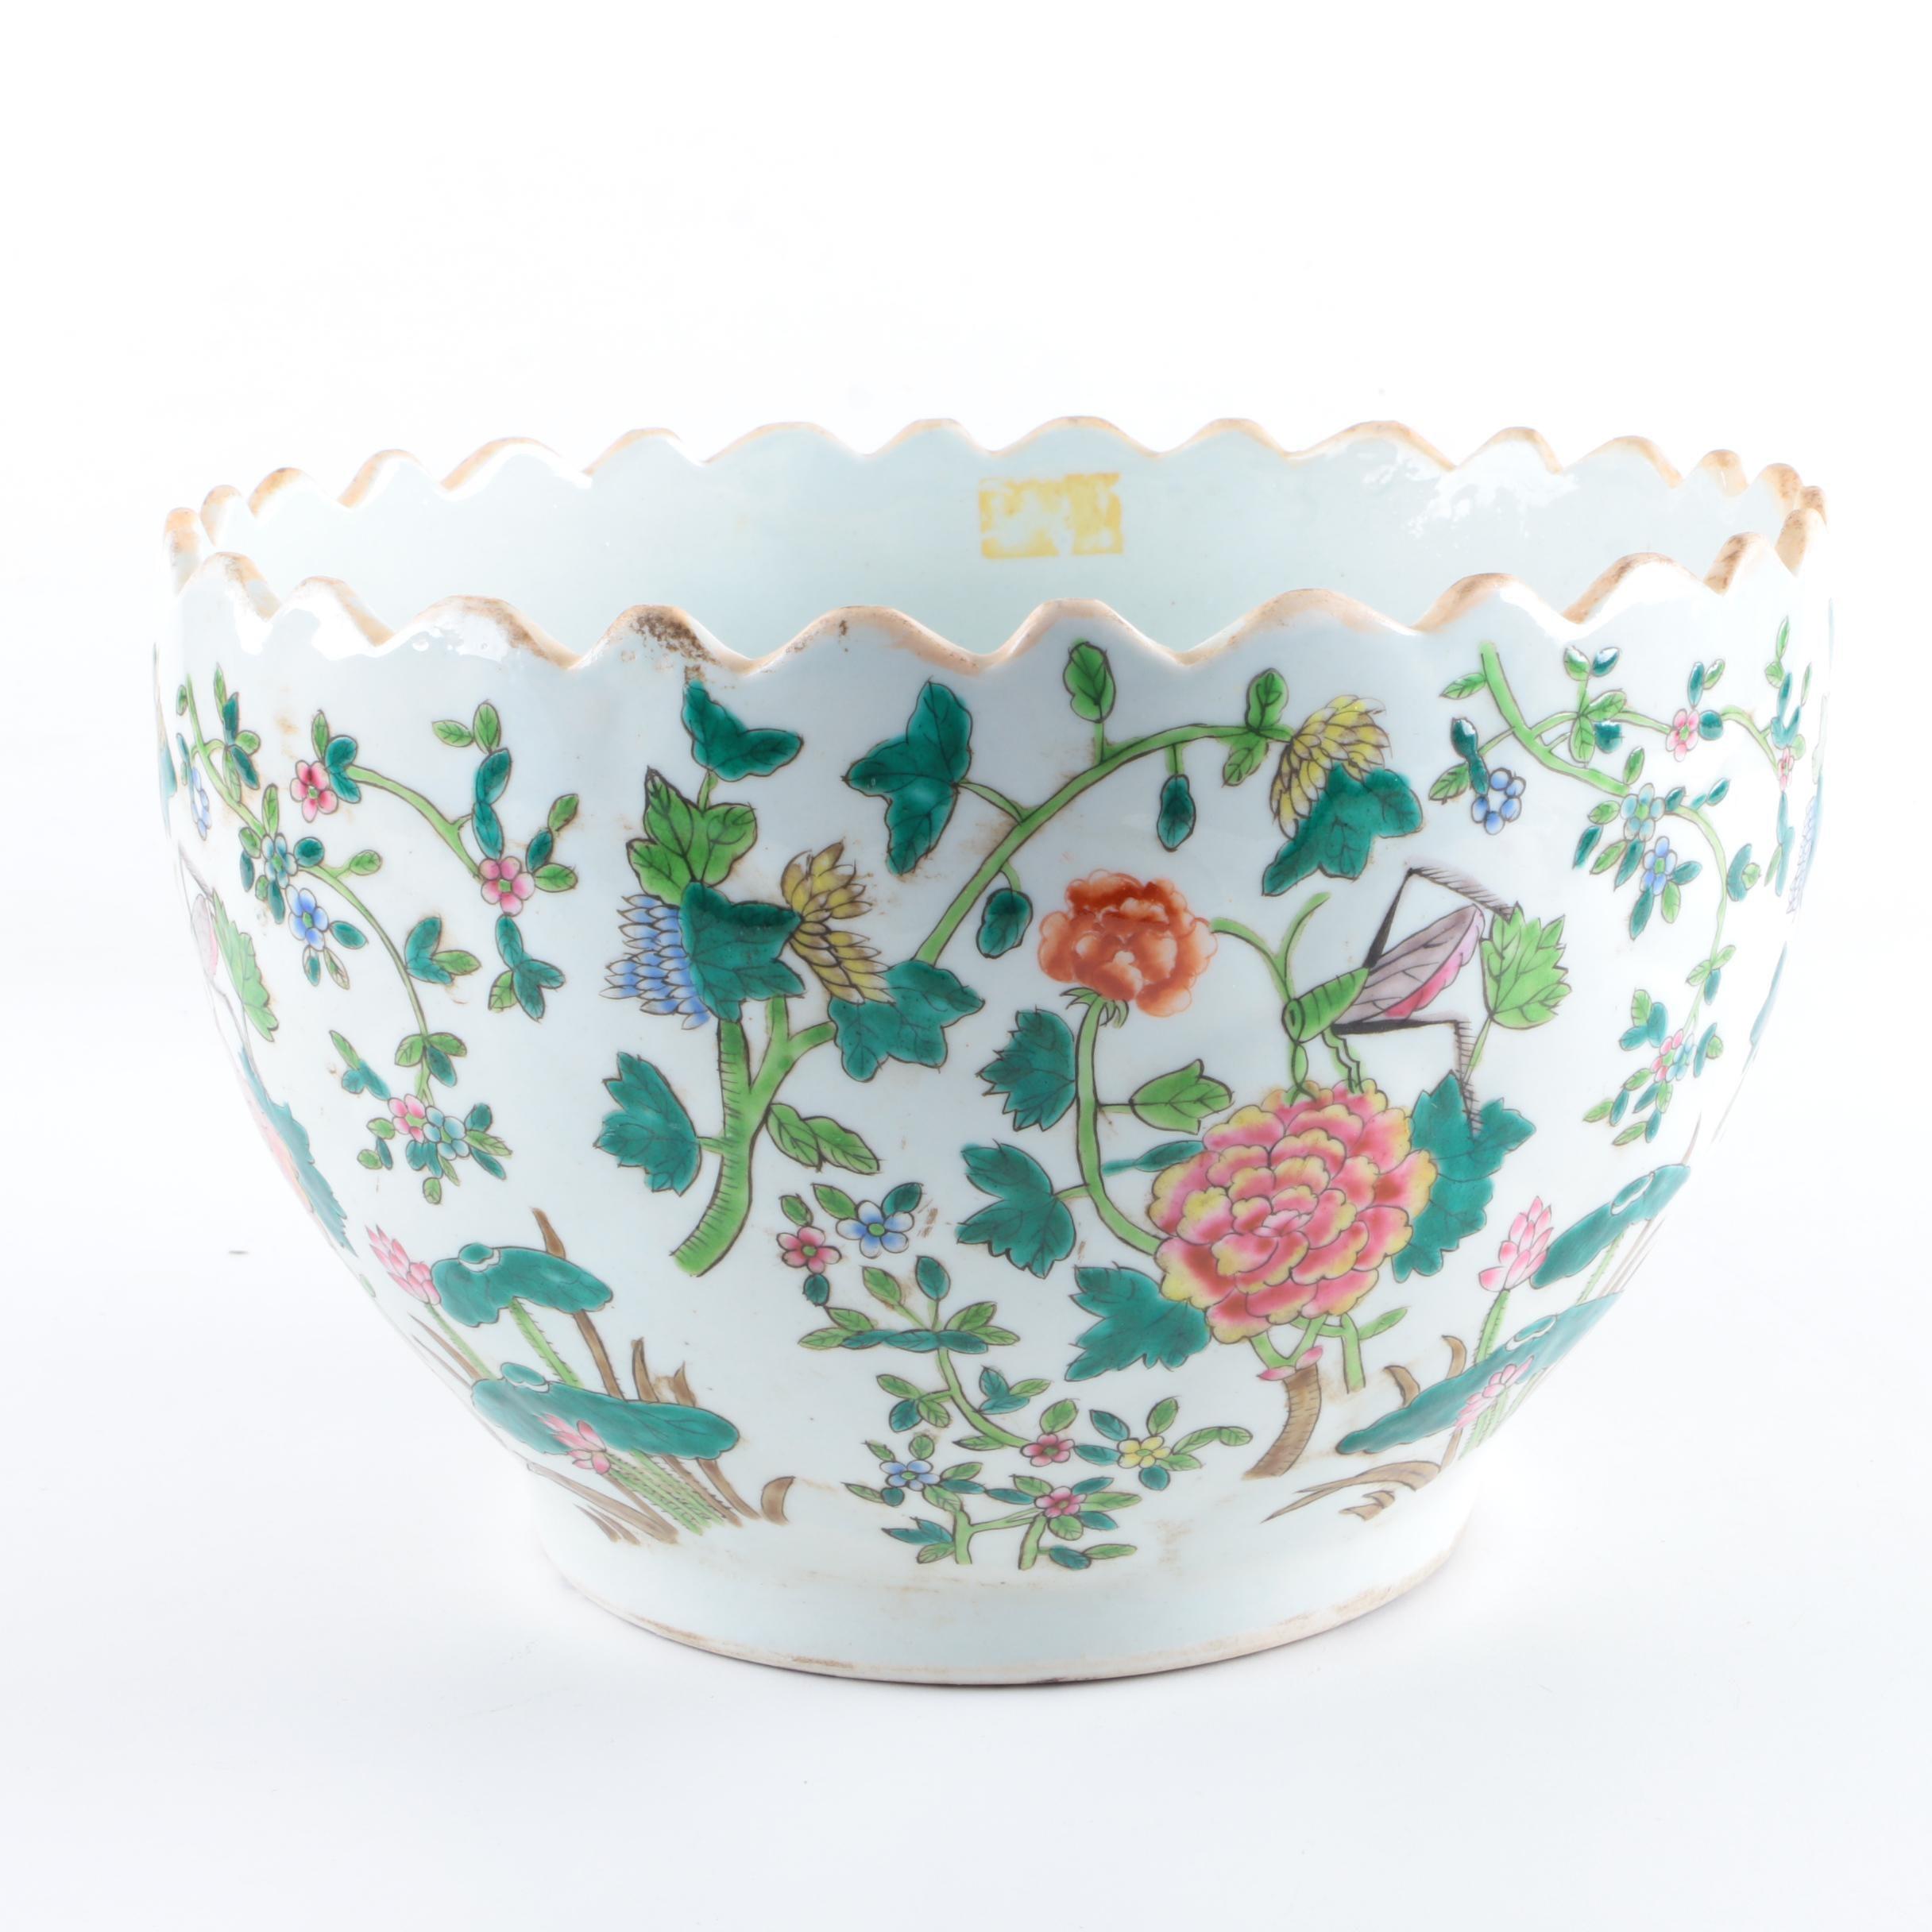 Chinese Floral Ceramic Planter